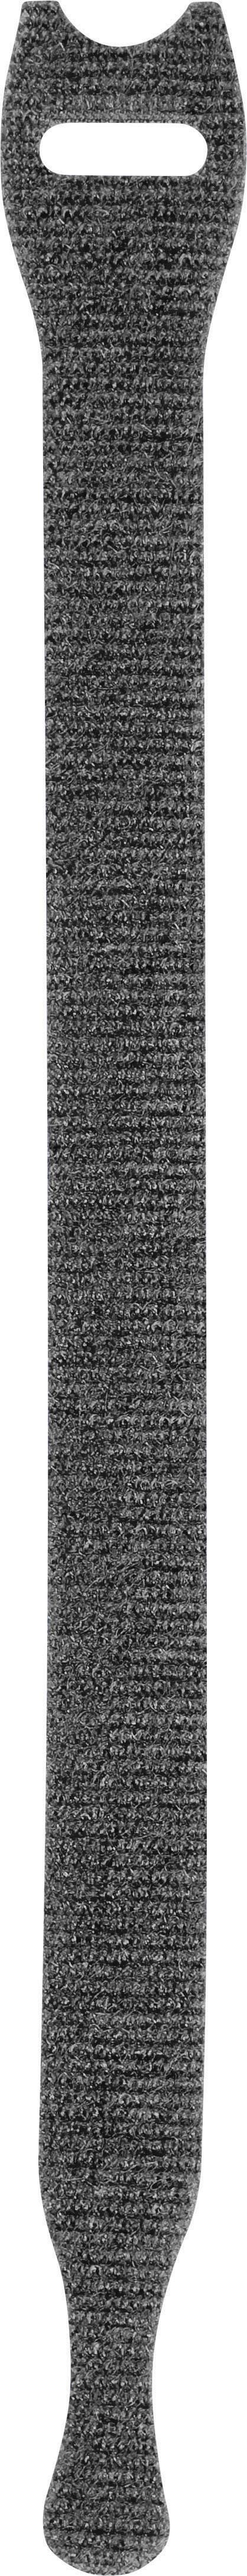 Káblový manažér na suchý zips TOOLCRAFT KL12X200SC, (d x š) 200 mm x 12 mm, čierna, 1 ks